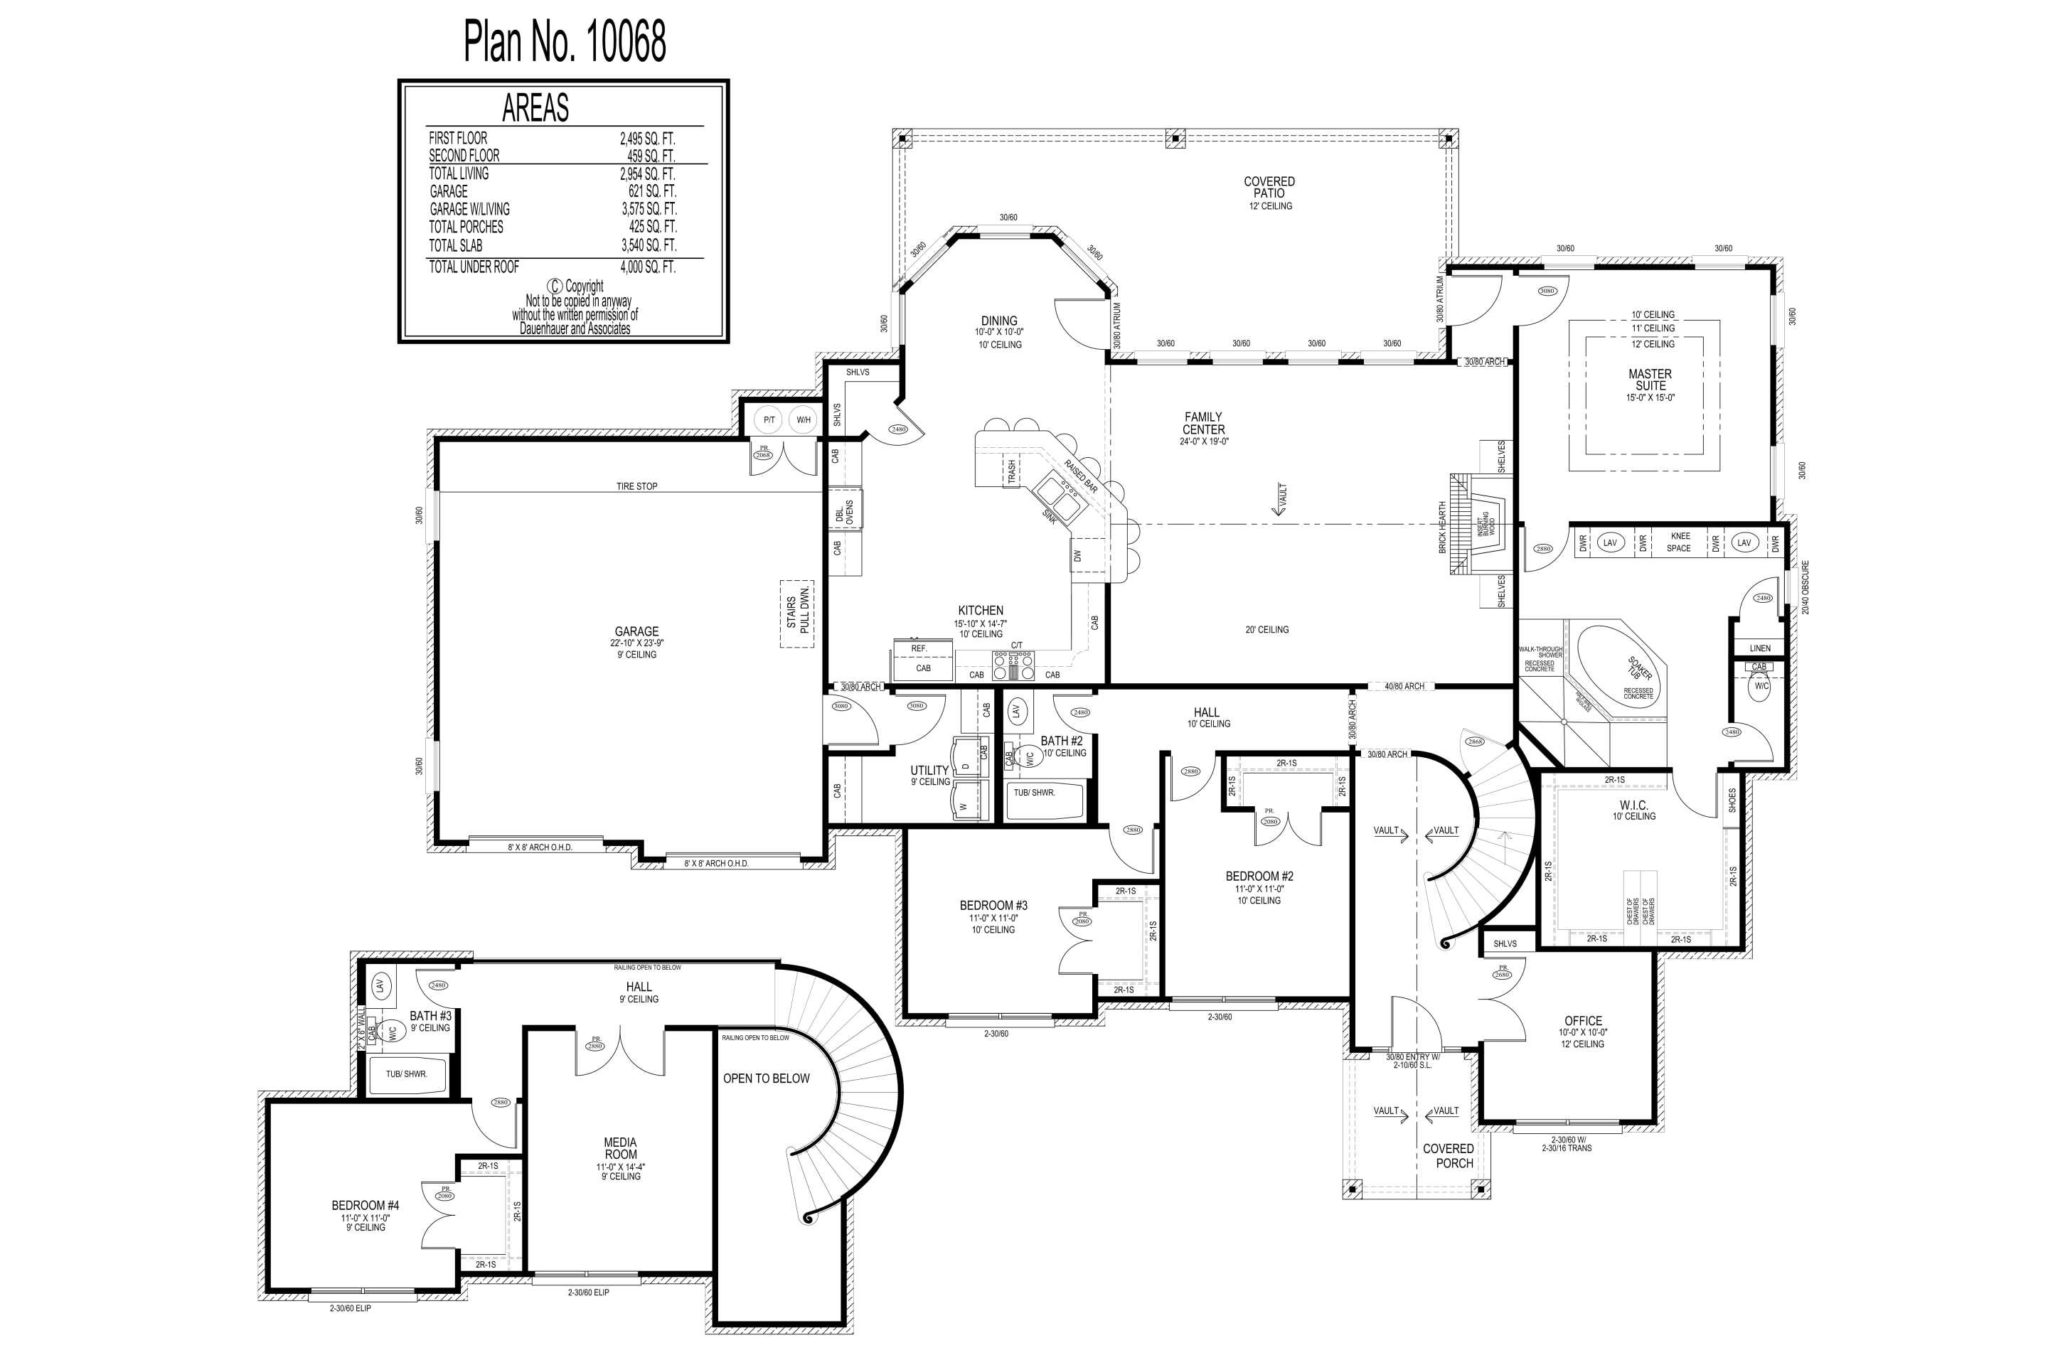 house-plan-10068-floor